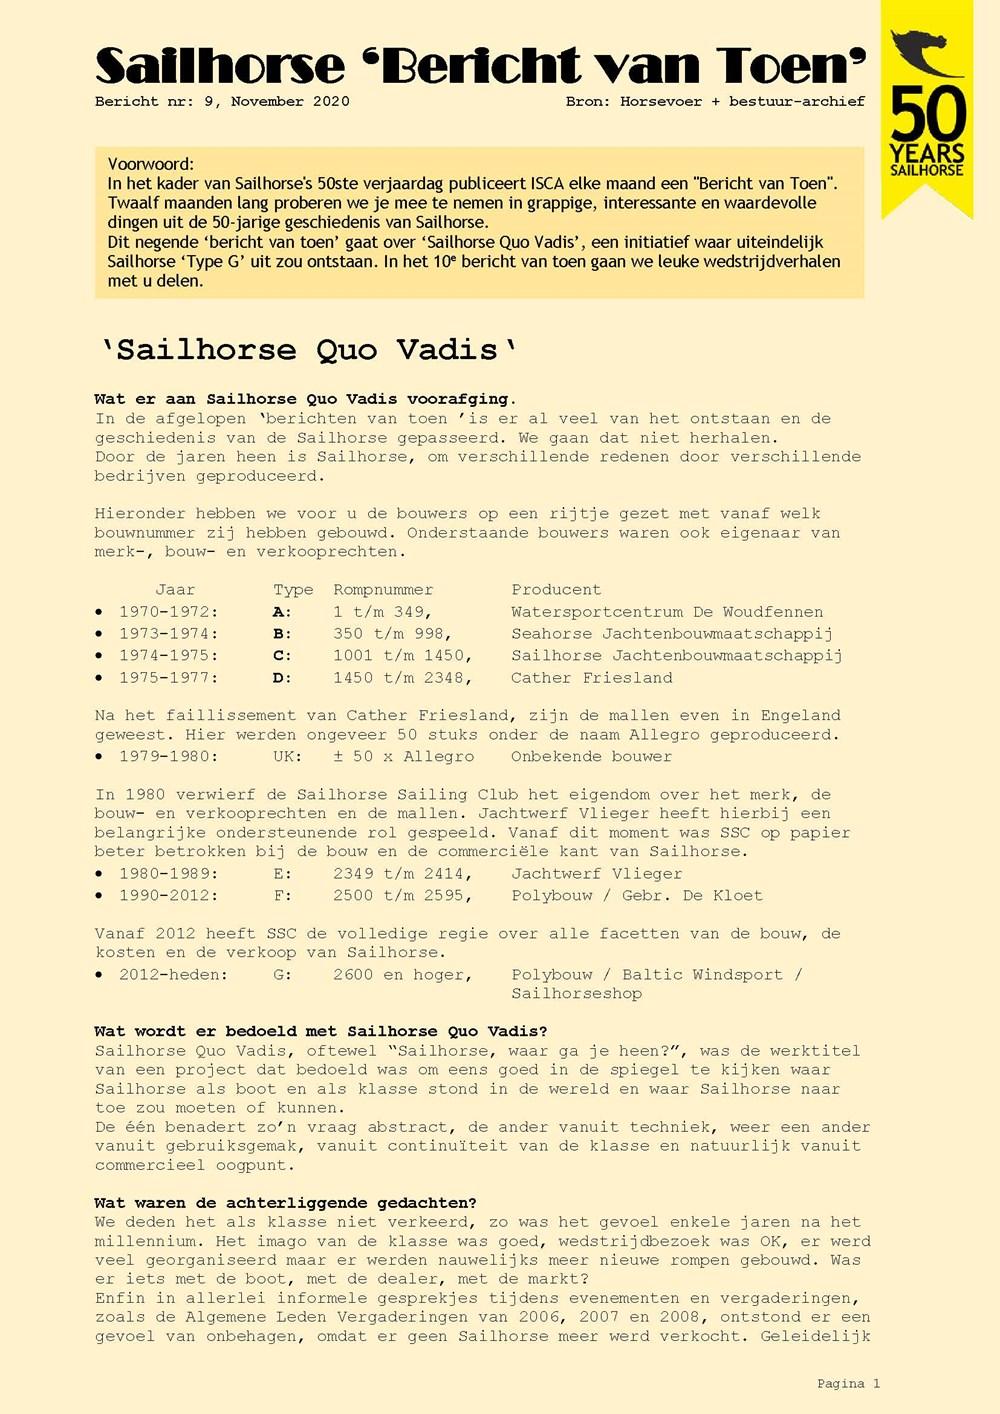 BvT09_Page_01.jpg